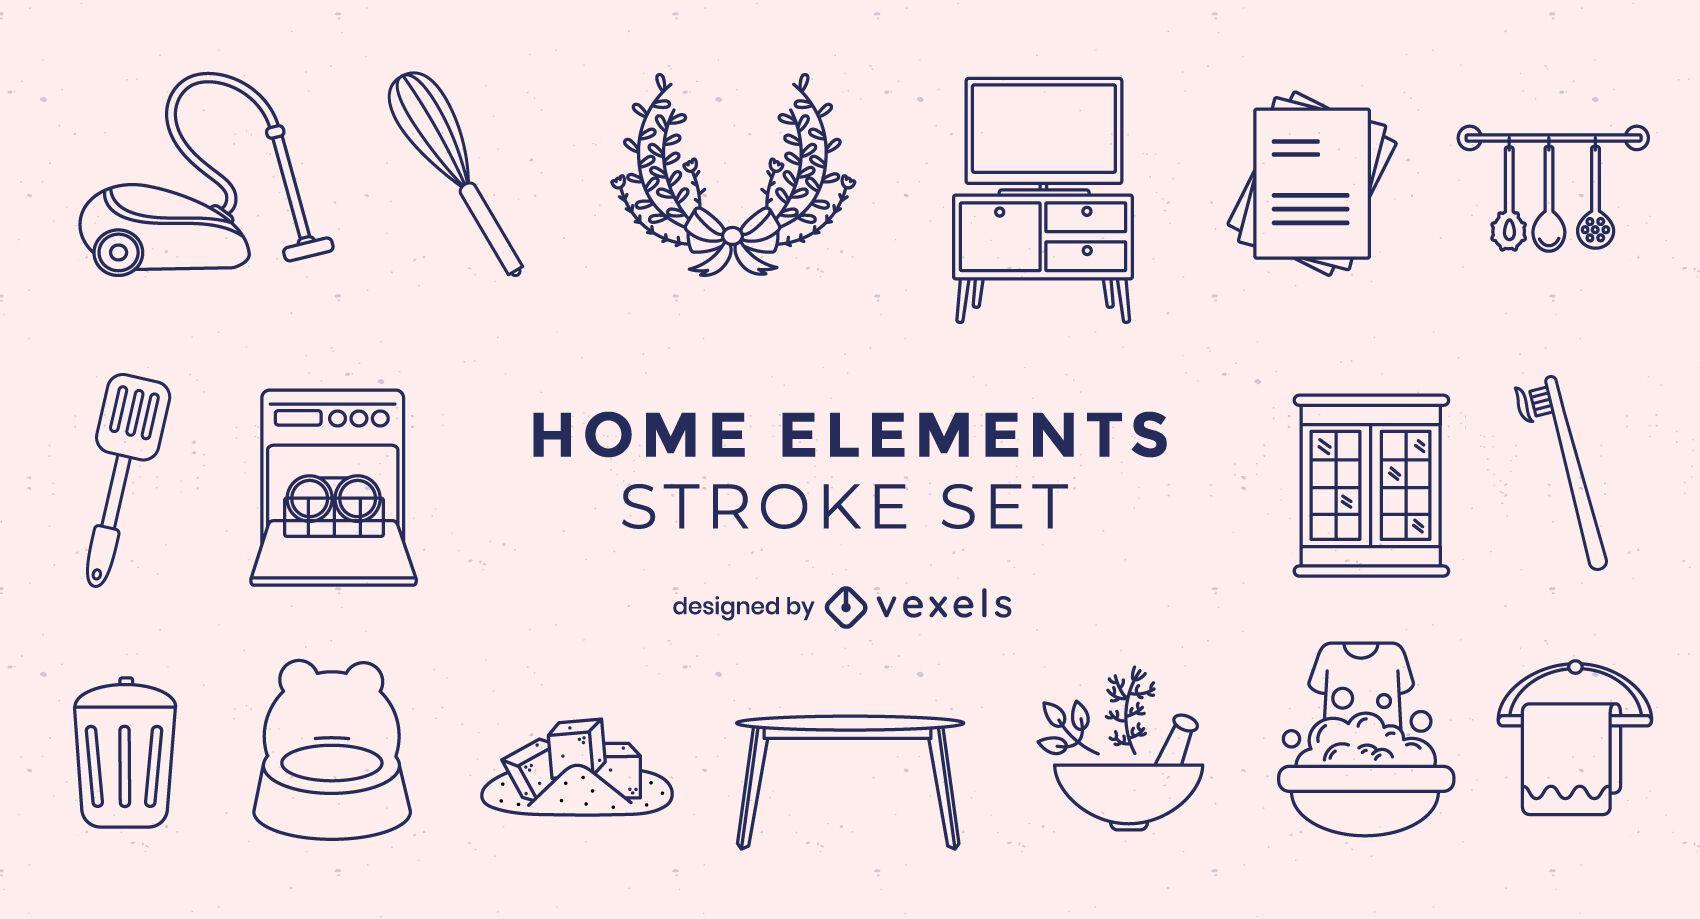 Household elements stroke pack